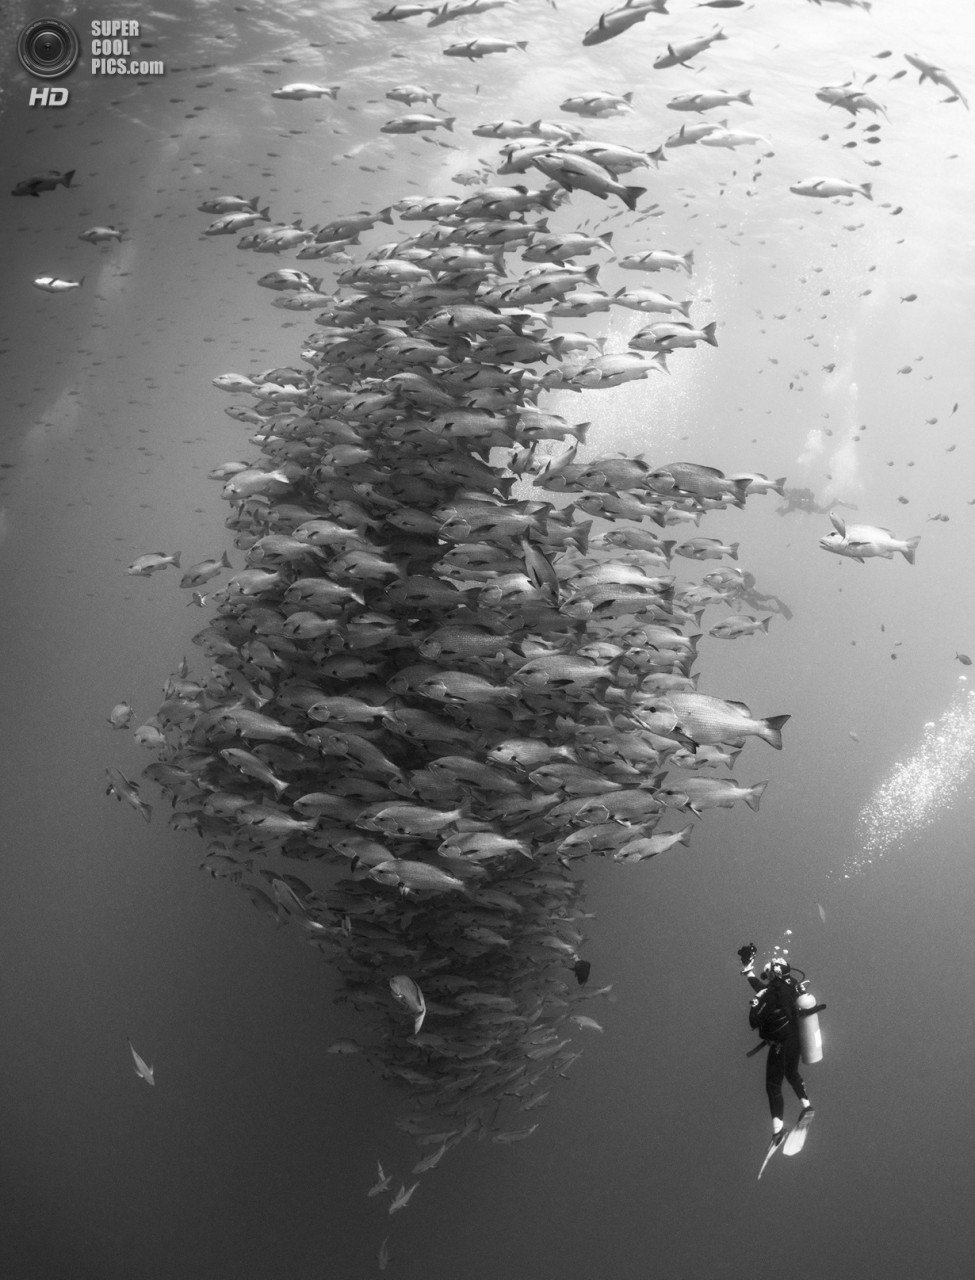 Категория: Wide-angle/Divers. 1 место. (Nadya Kulagina/UnderwaterPhotography.com)